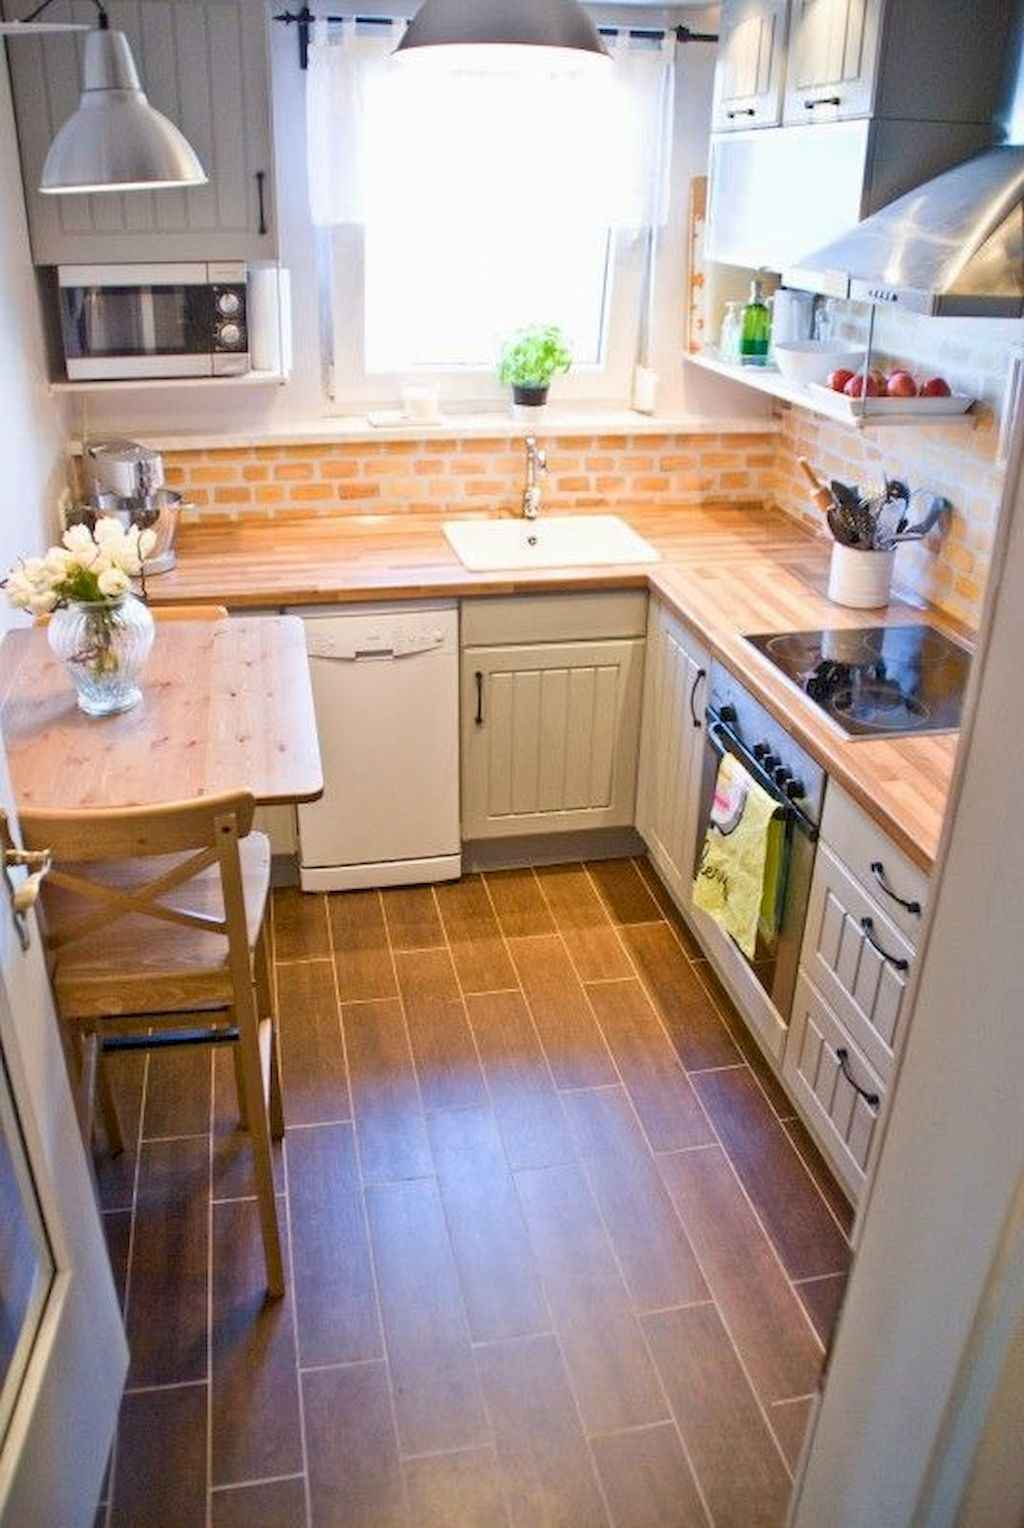 42 Tiny House Kitchen Storage Organization and Tips Ideas